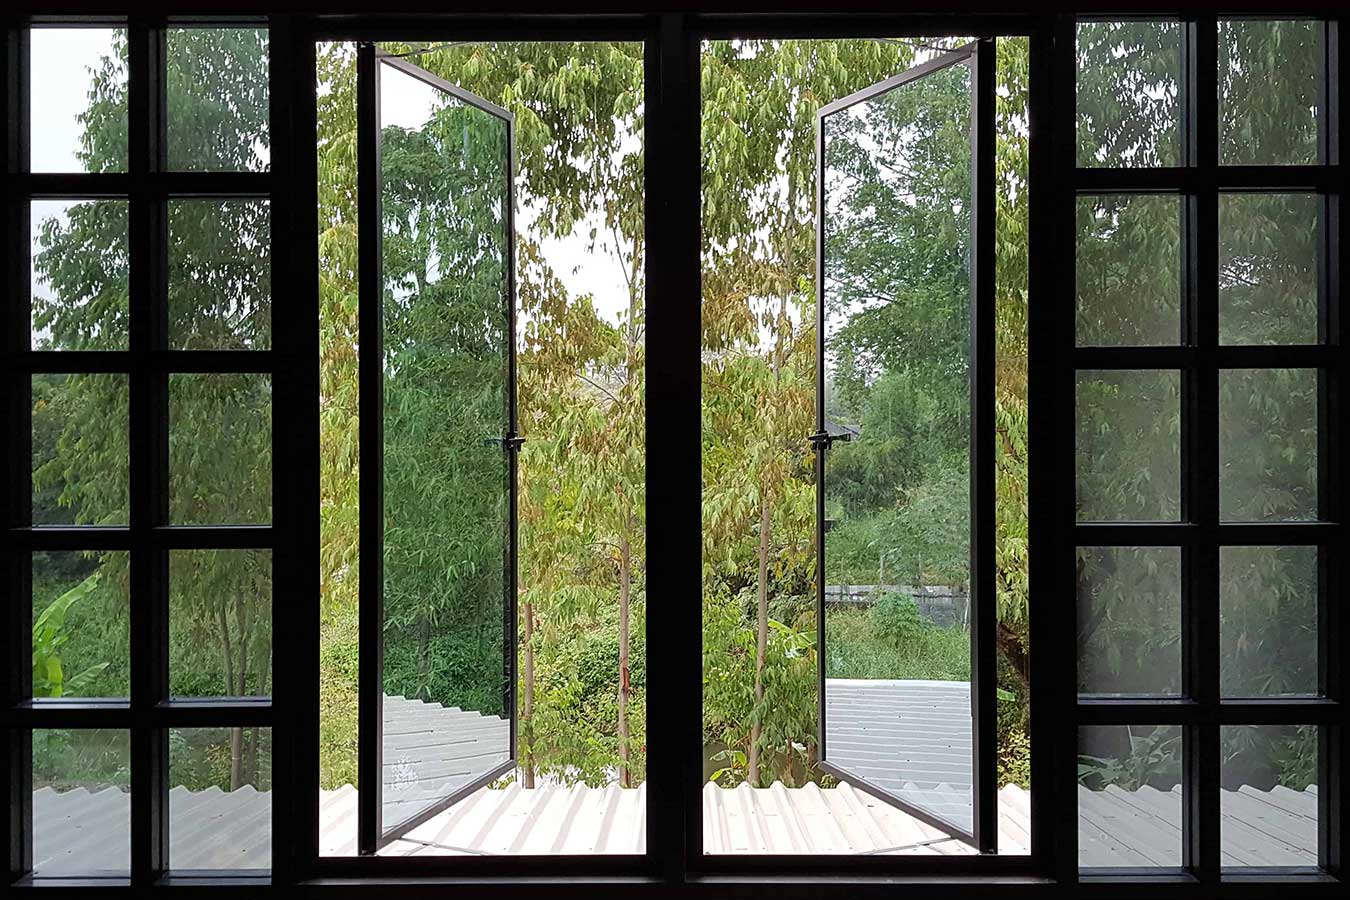 aluminyum_kapi-pencere1